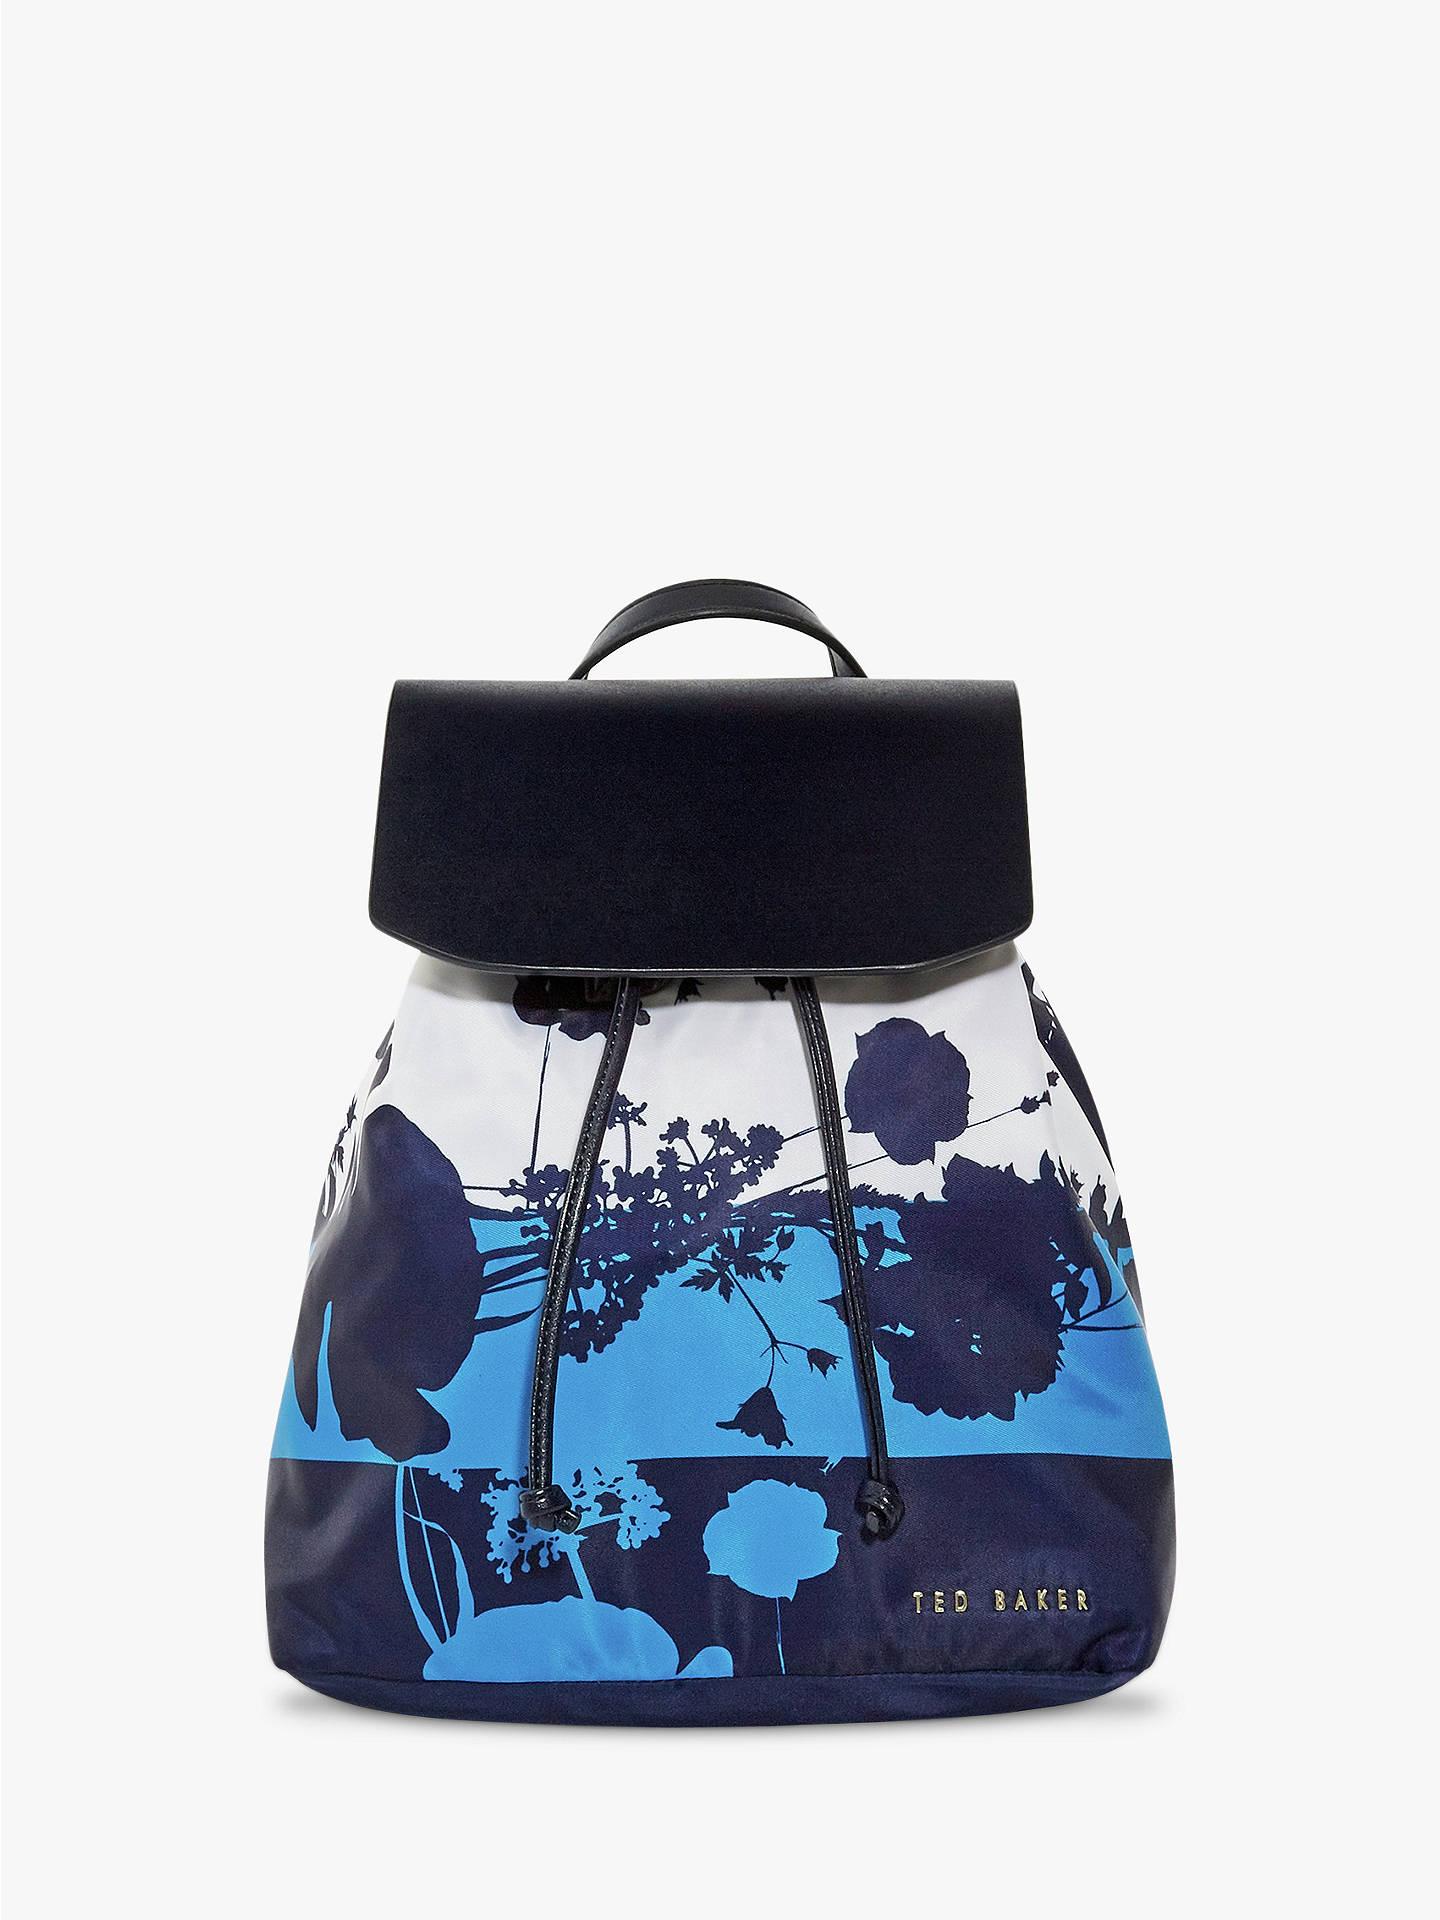 Ted Baker Amarily Drawstring Backpack, Dark Blue £39.50 @ John Lewis & Partners + Free C&C